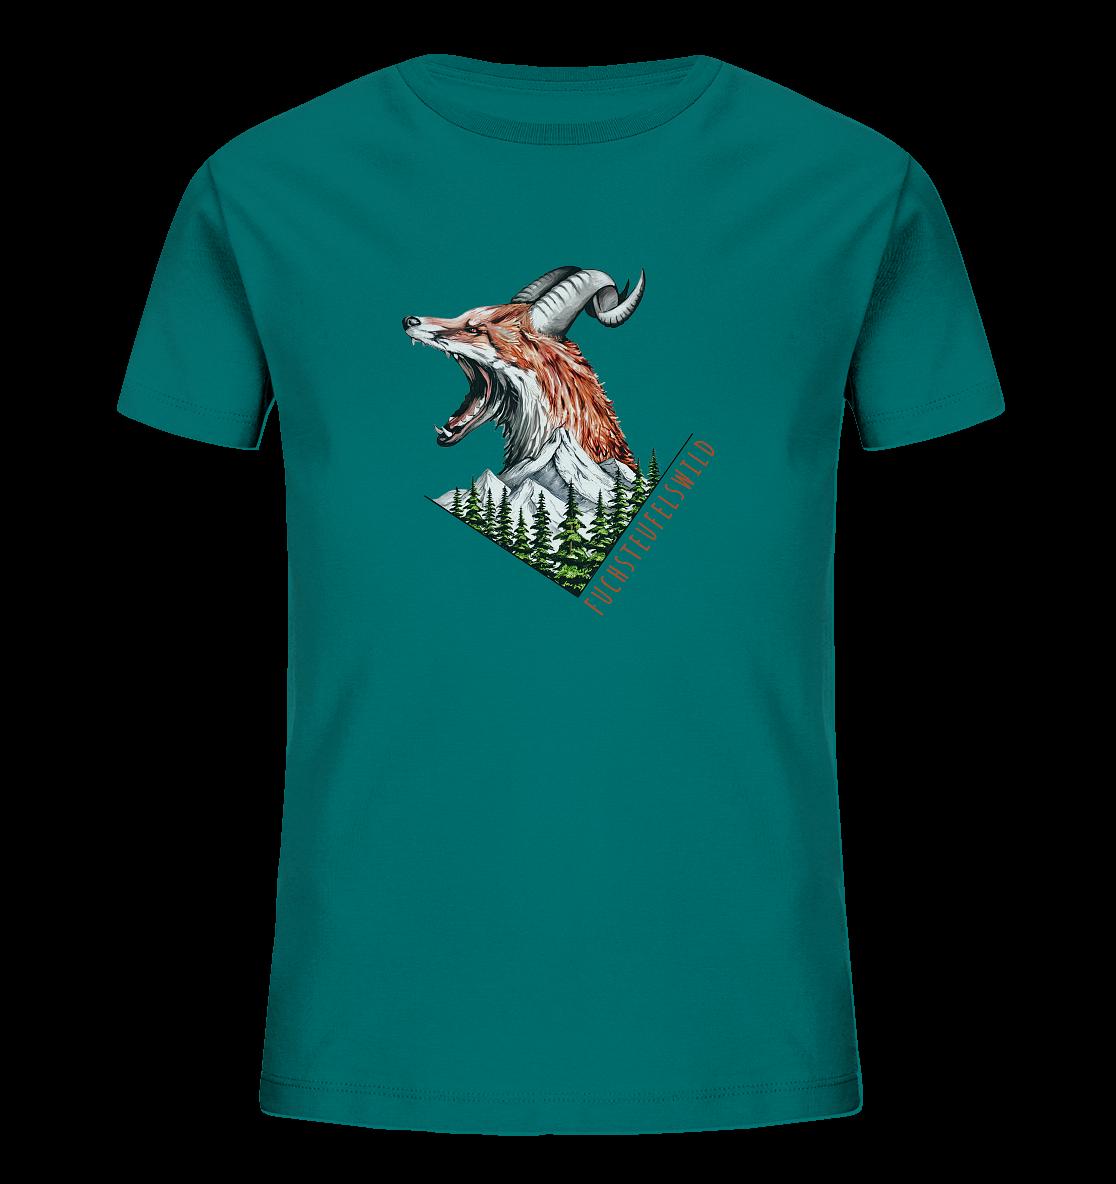 front-kids-organic-shirt-007373-1116x-1.png